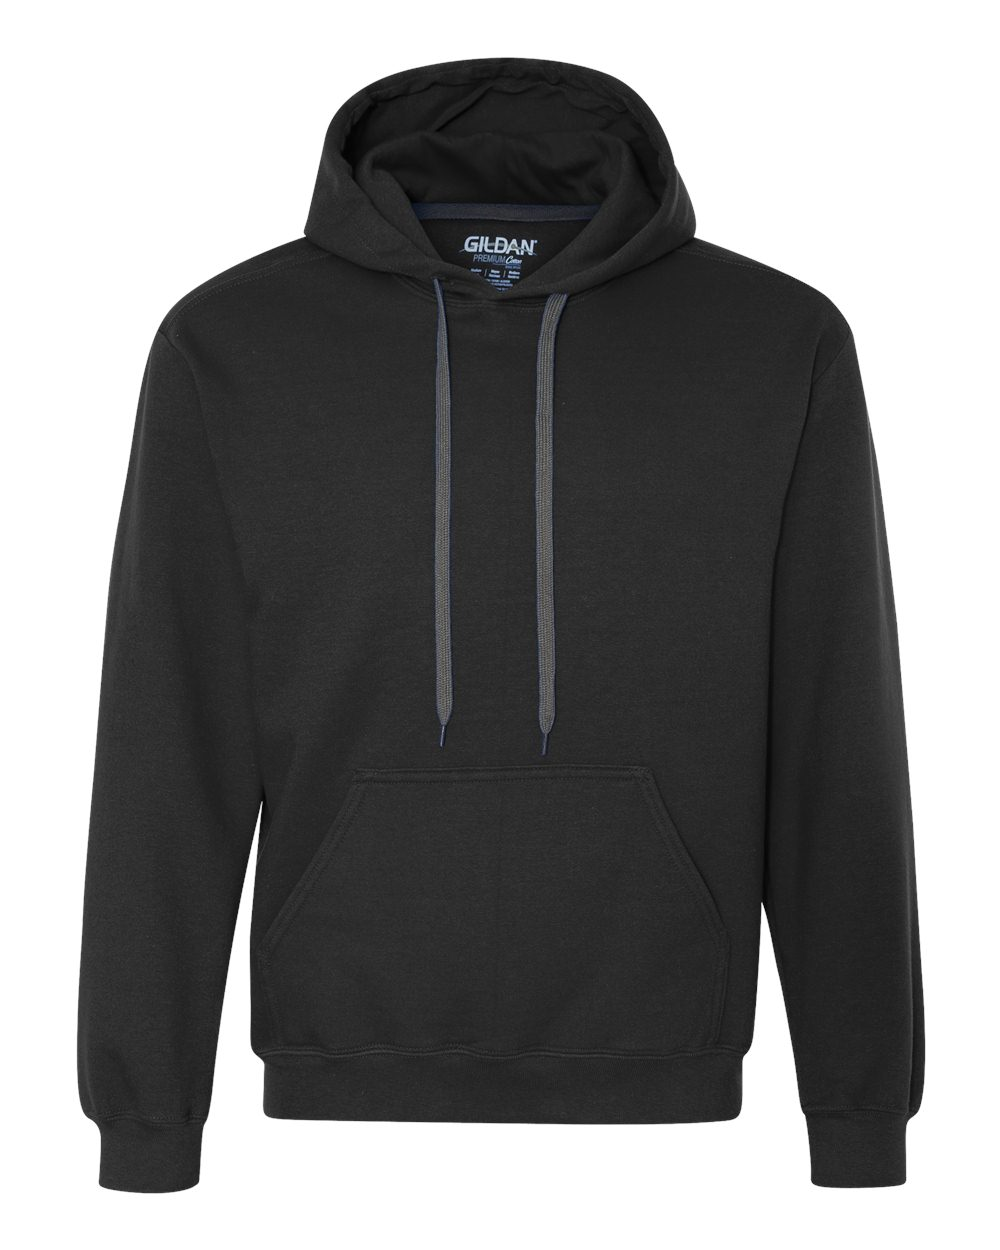 Picture of Gildan Premium Cotton Ring Spun Fleece Hooded Sweatshirt